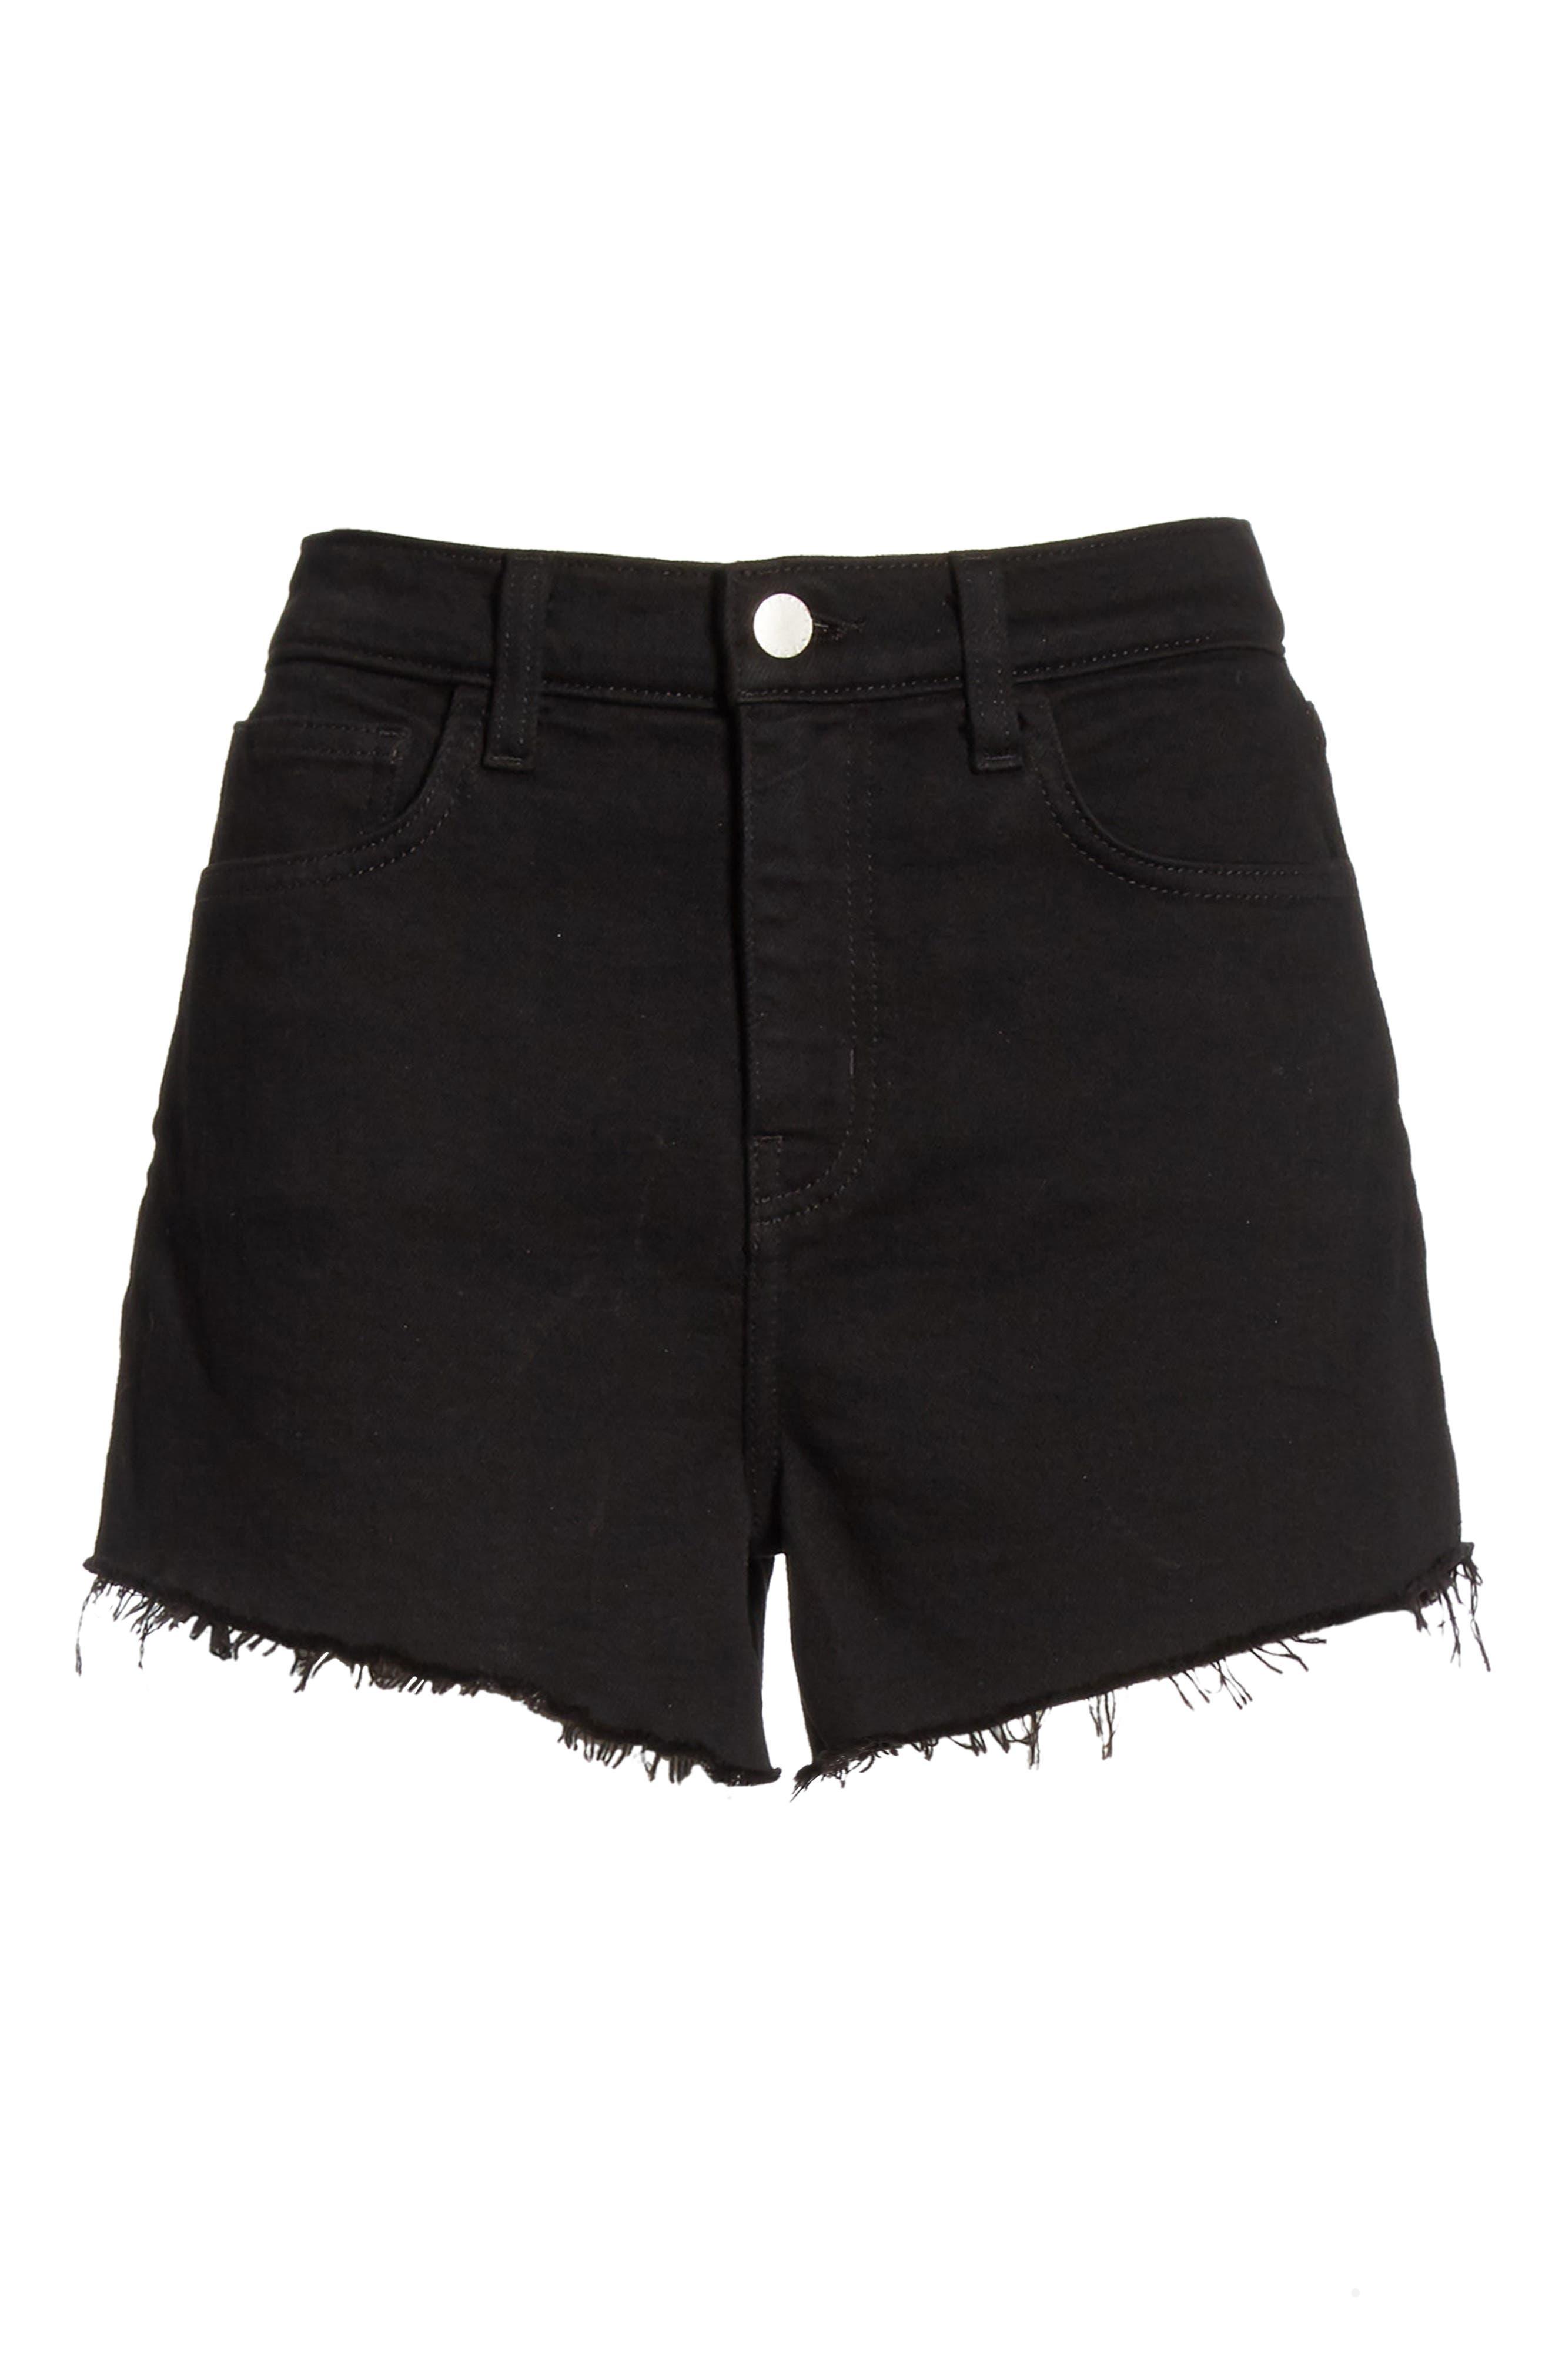 L'AGENCE, Ryland High Waist Denim Shorts, Alternate thumbnail 7, color, NOIR